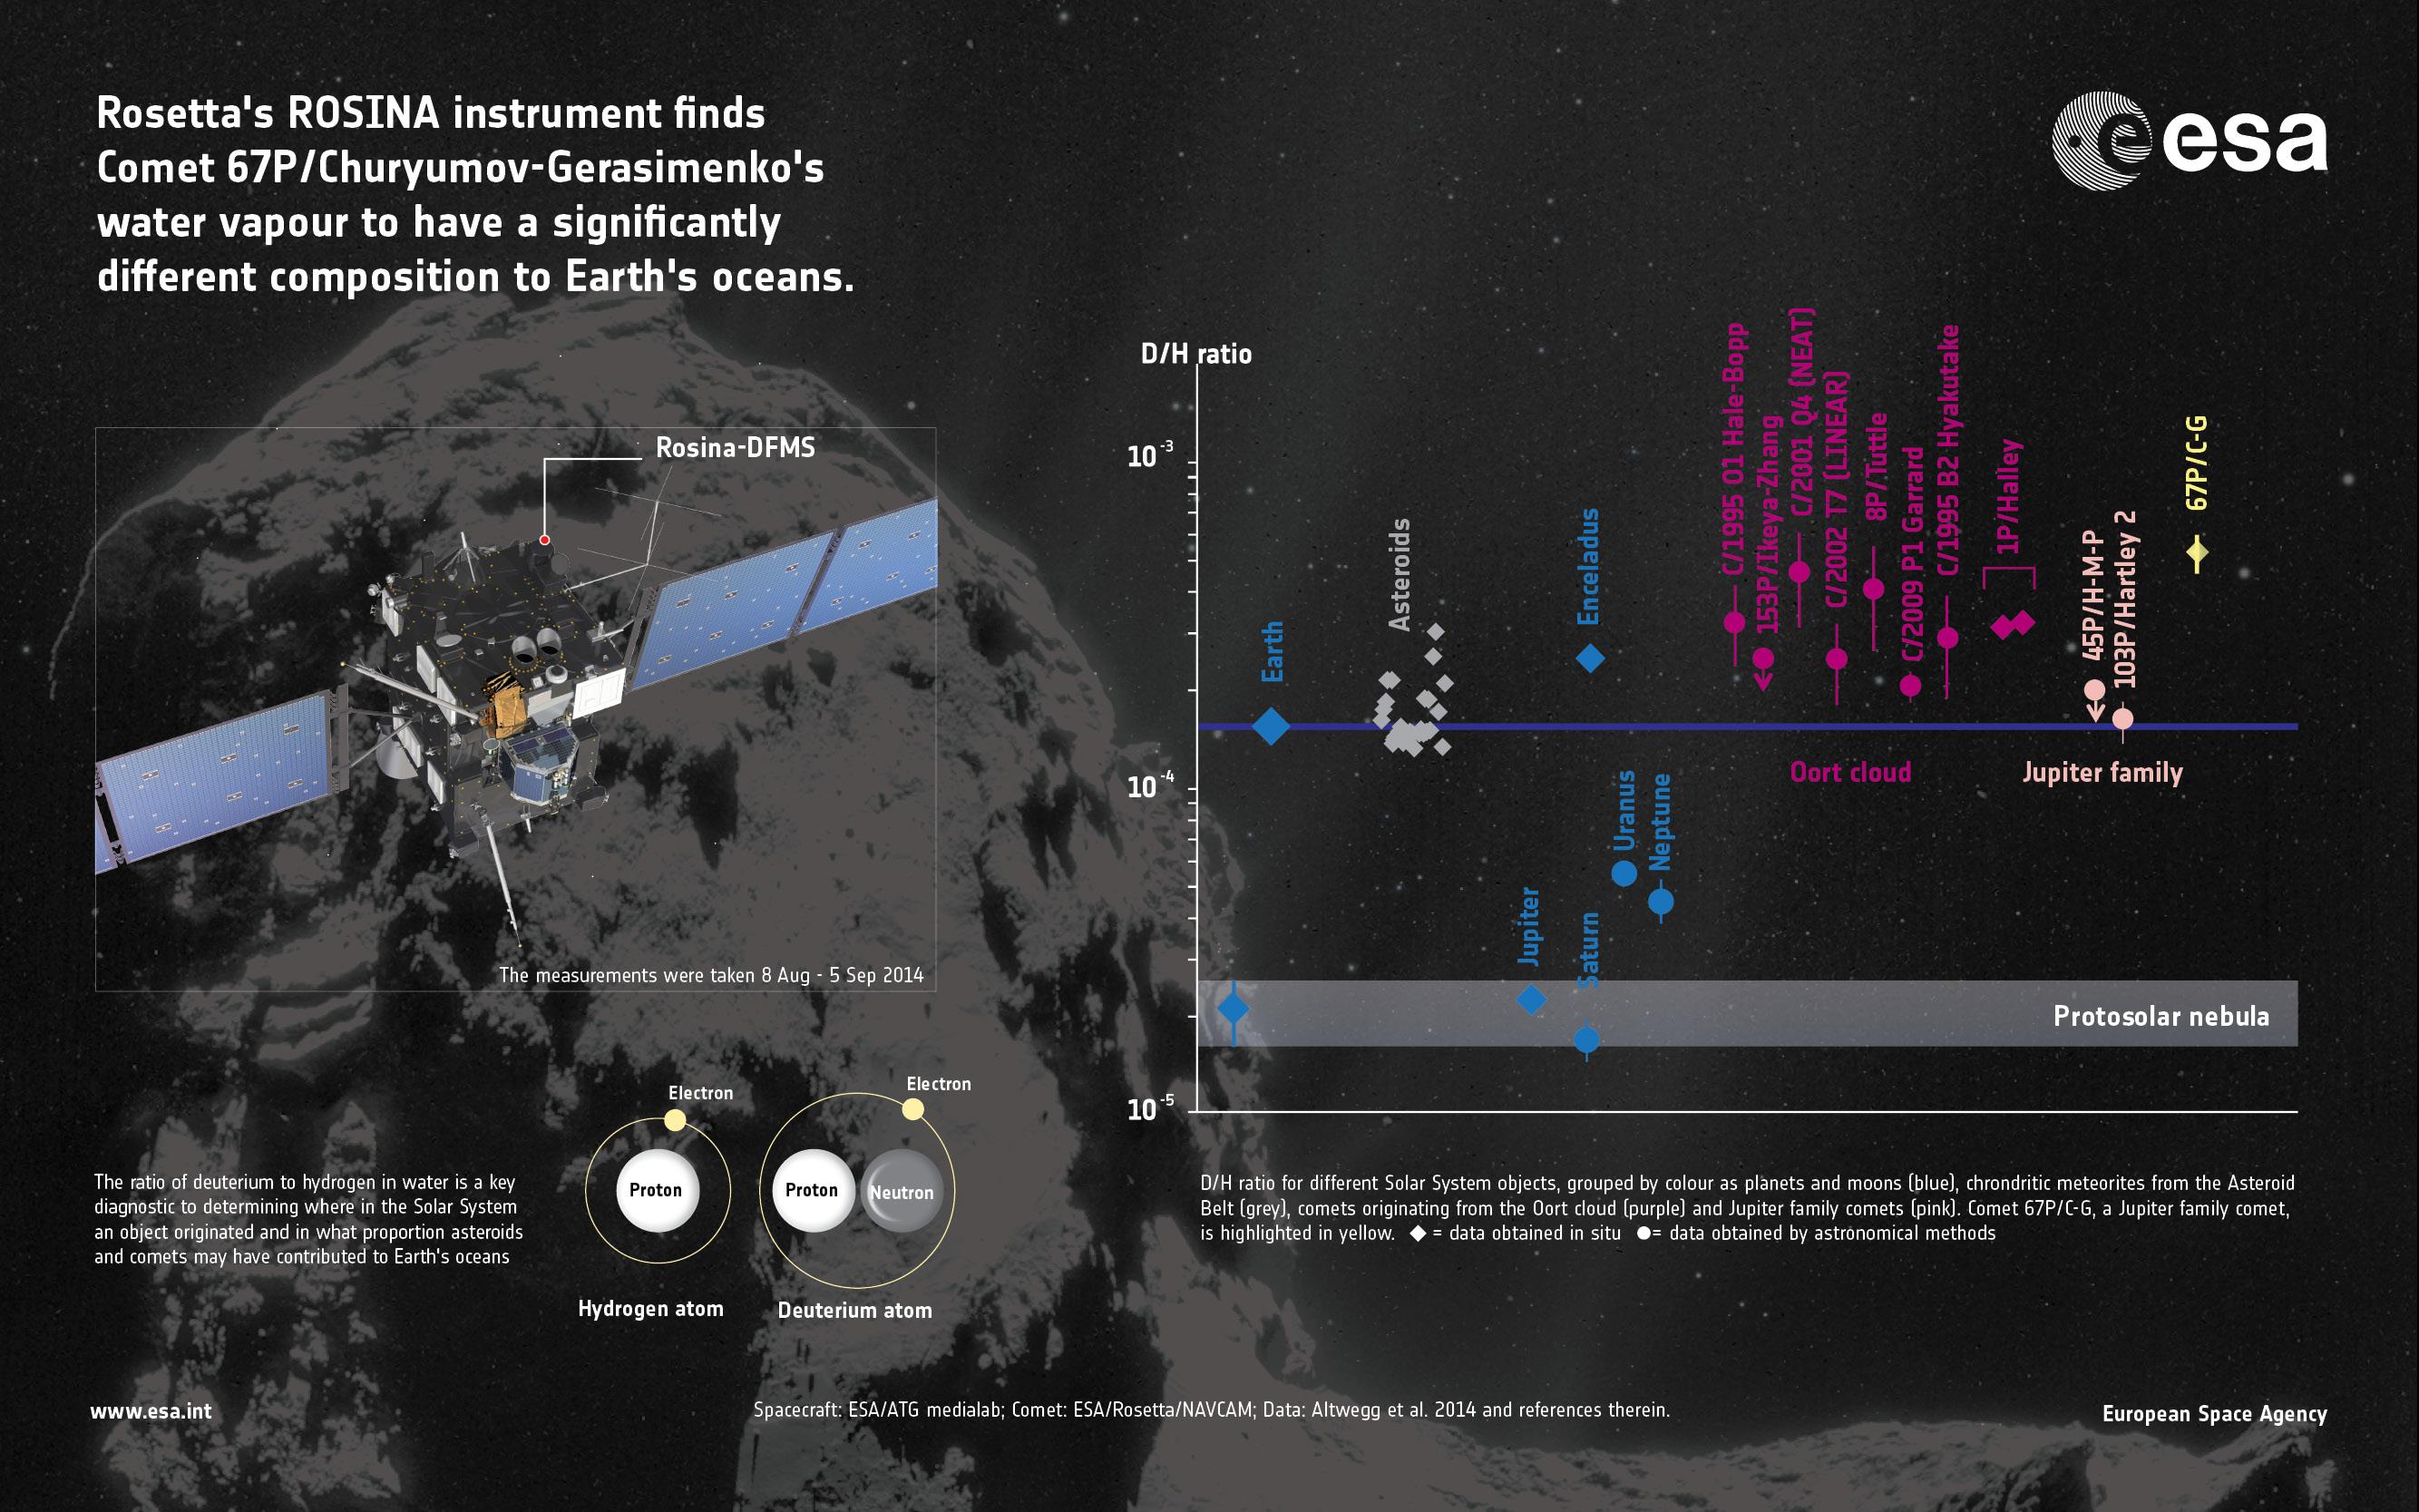 Rosetta - Cometa 67P